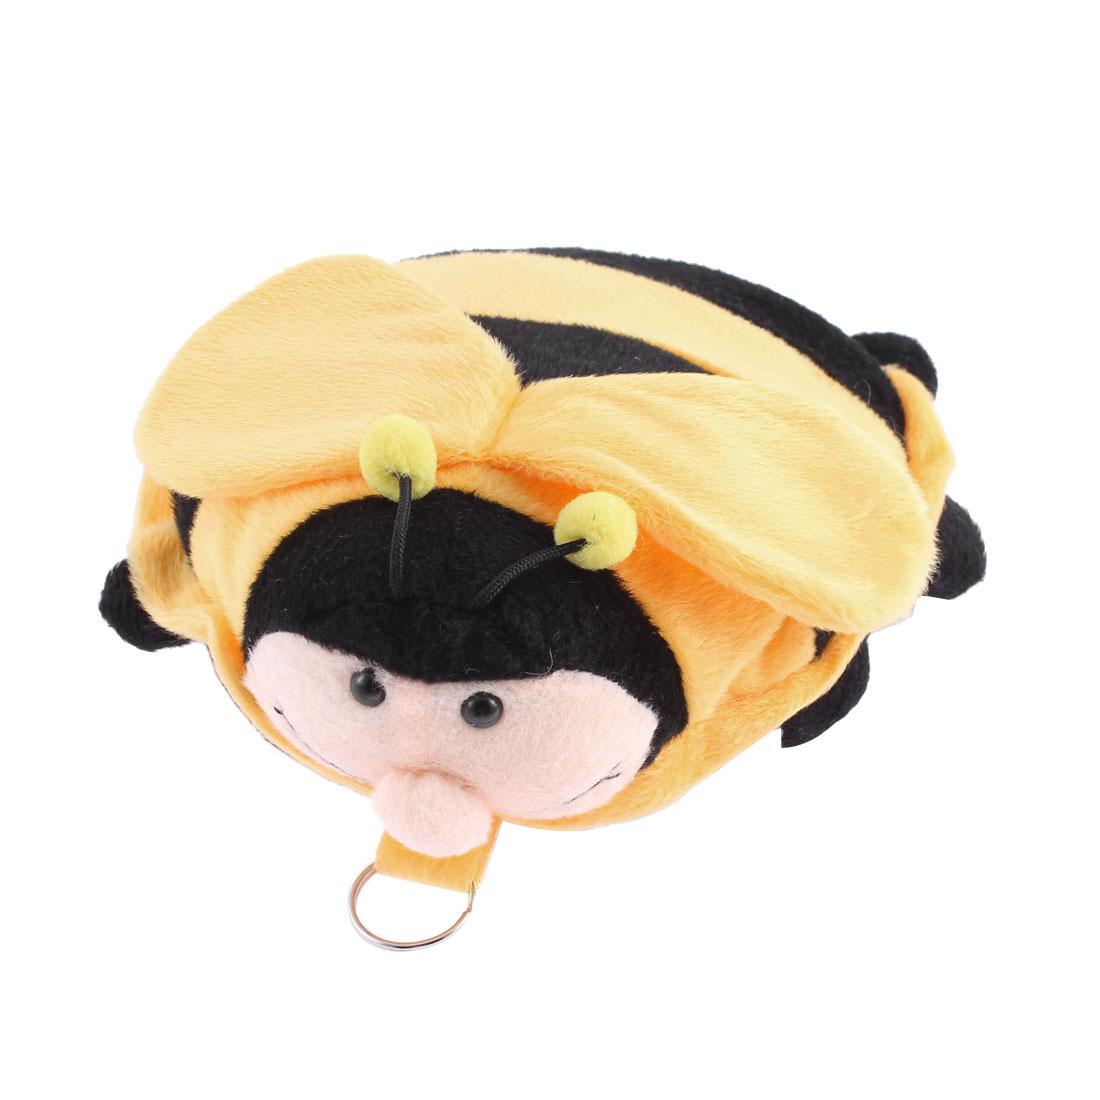 Cartoon Bee Design Zippered Keyring Plush CD VCD Storage Bag Holder Yellow Black